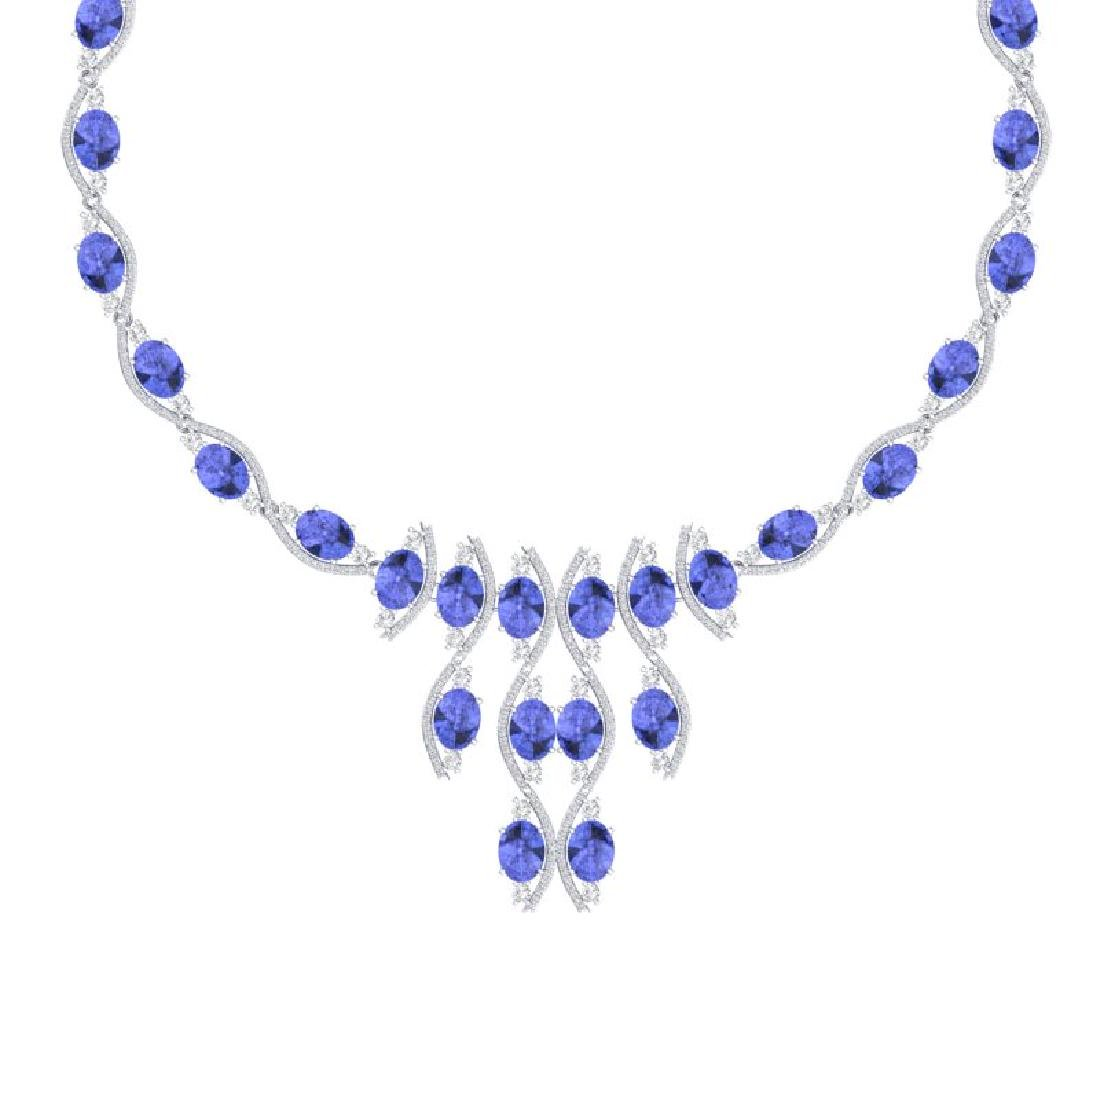 65.60 CTW Royalty Tanzanite & VS Diamond Necklace 18K - 2